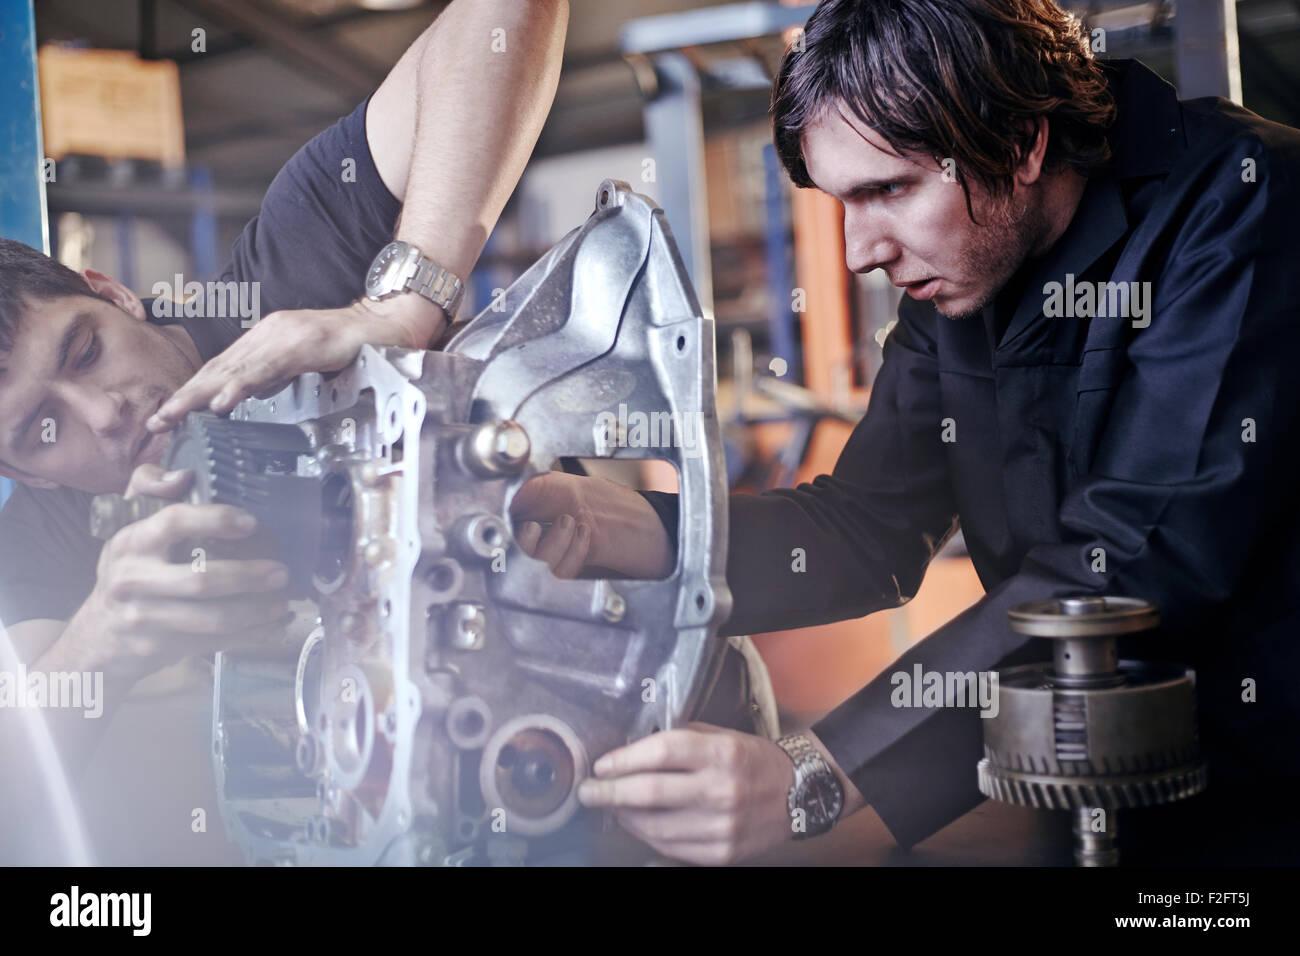 Mechanics fixing part in auto repair shop - Stock Image